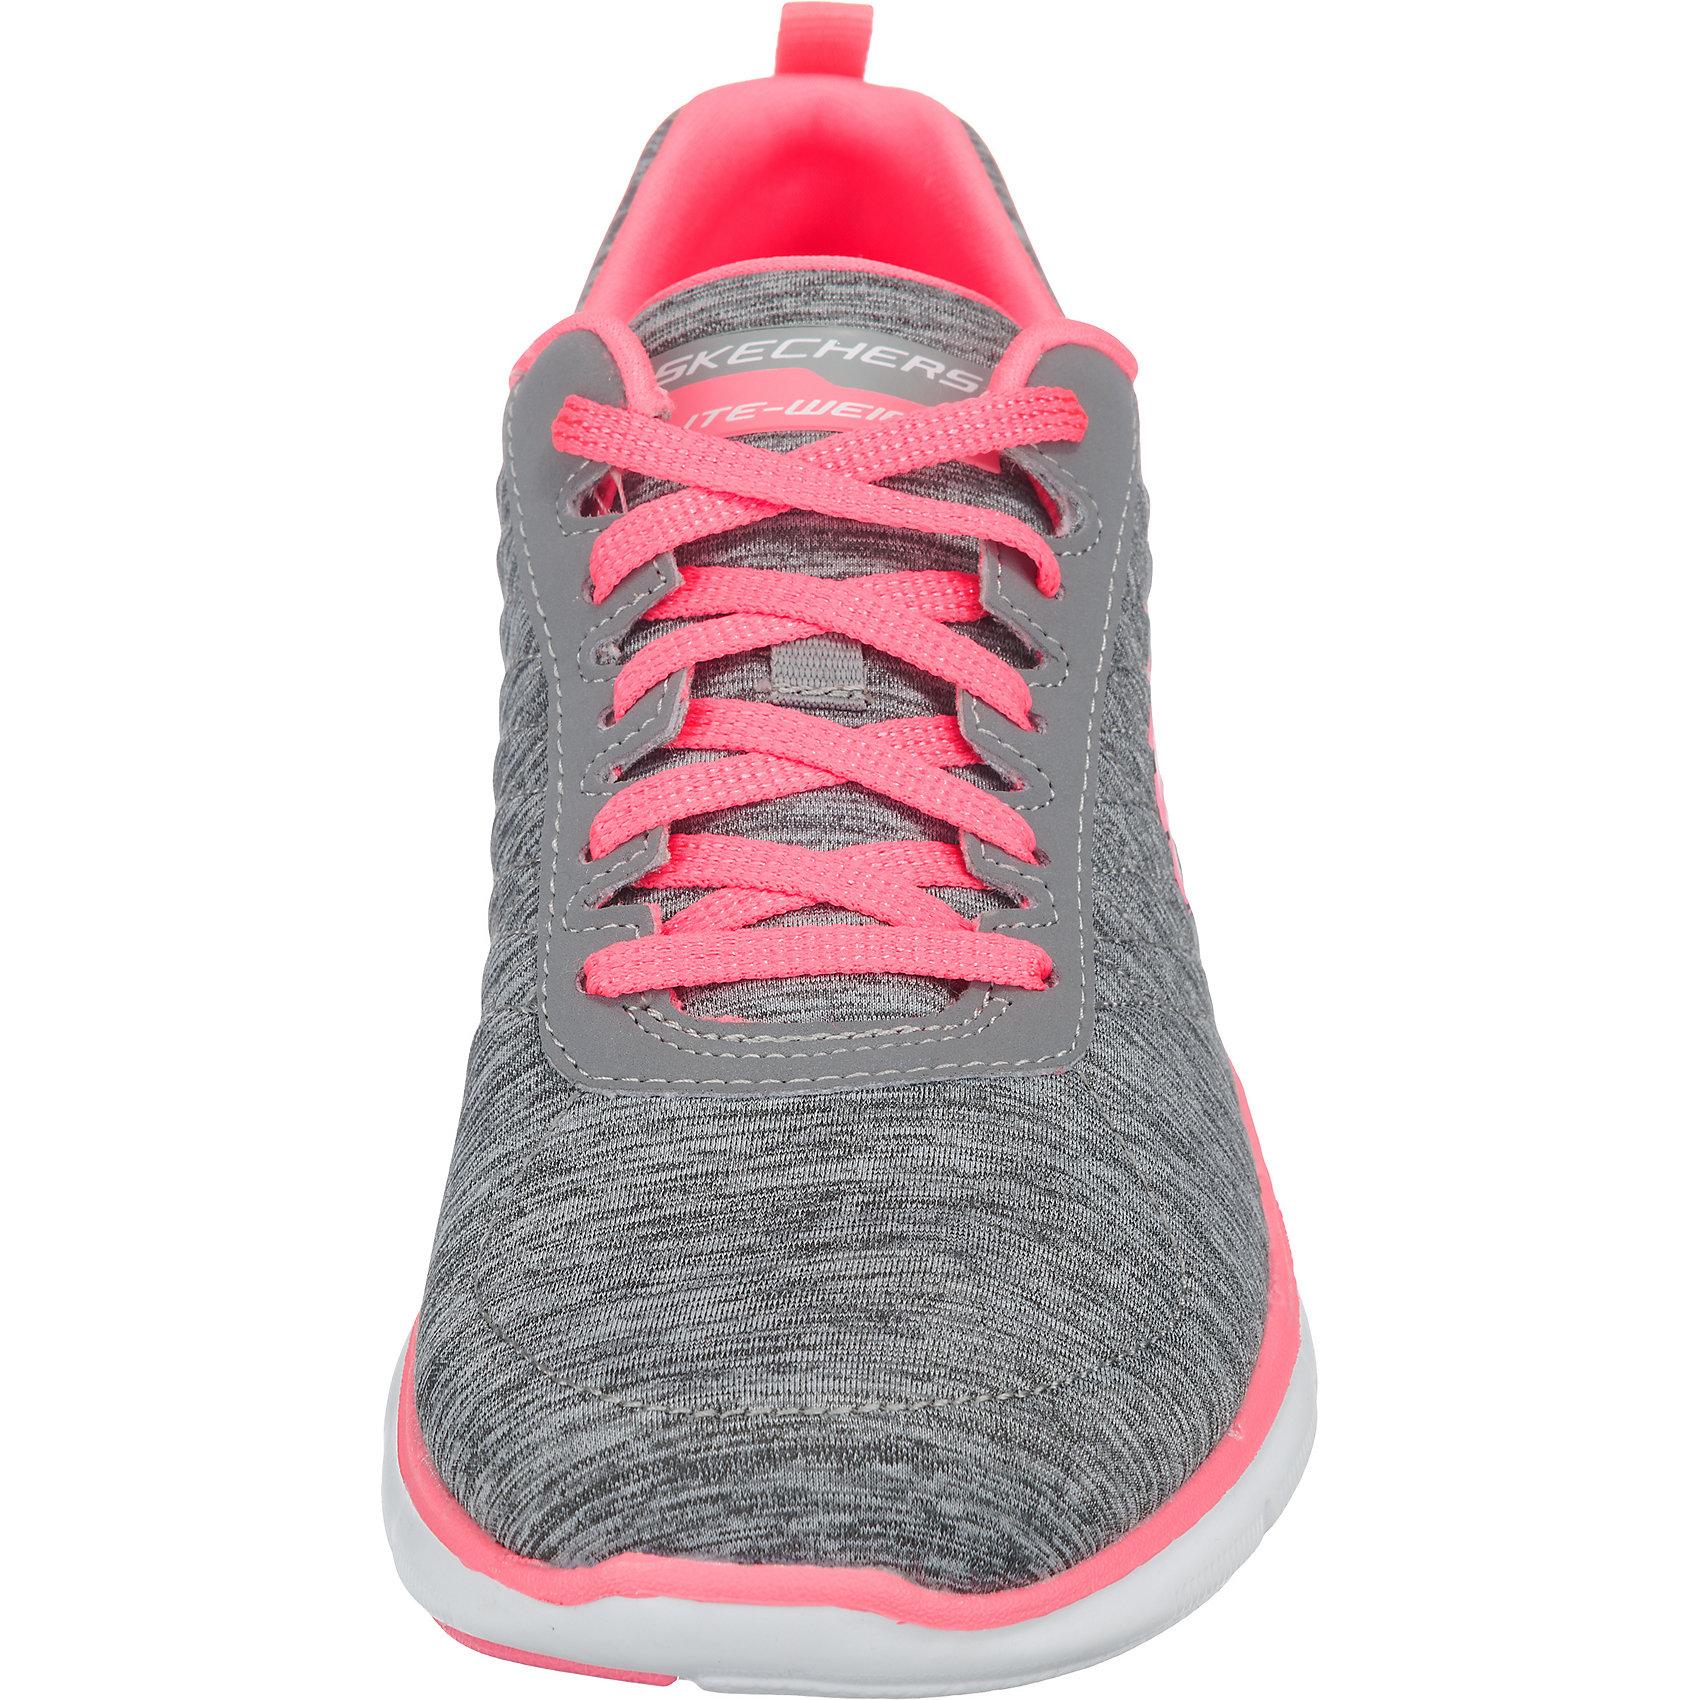 Neu SKECHERS Flex Appeal 2.0 Sneakers 5761869 für Damen Damen Damen 596091